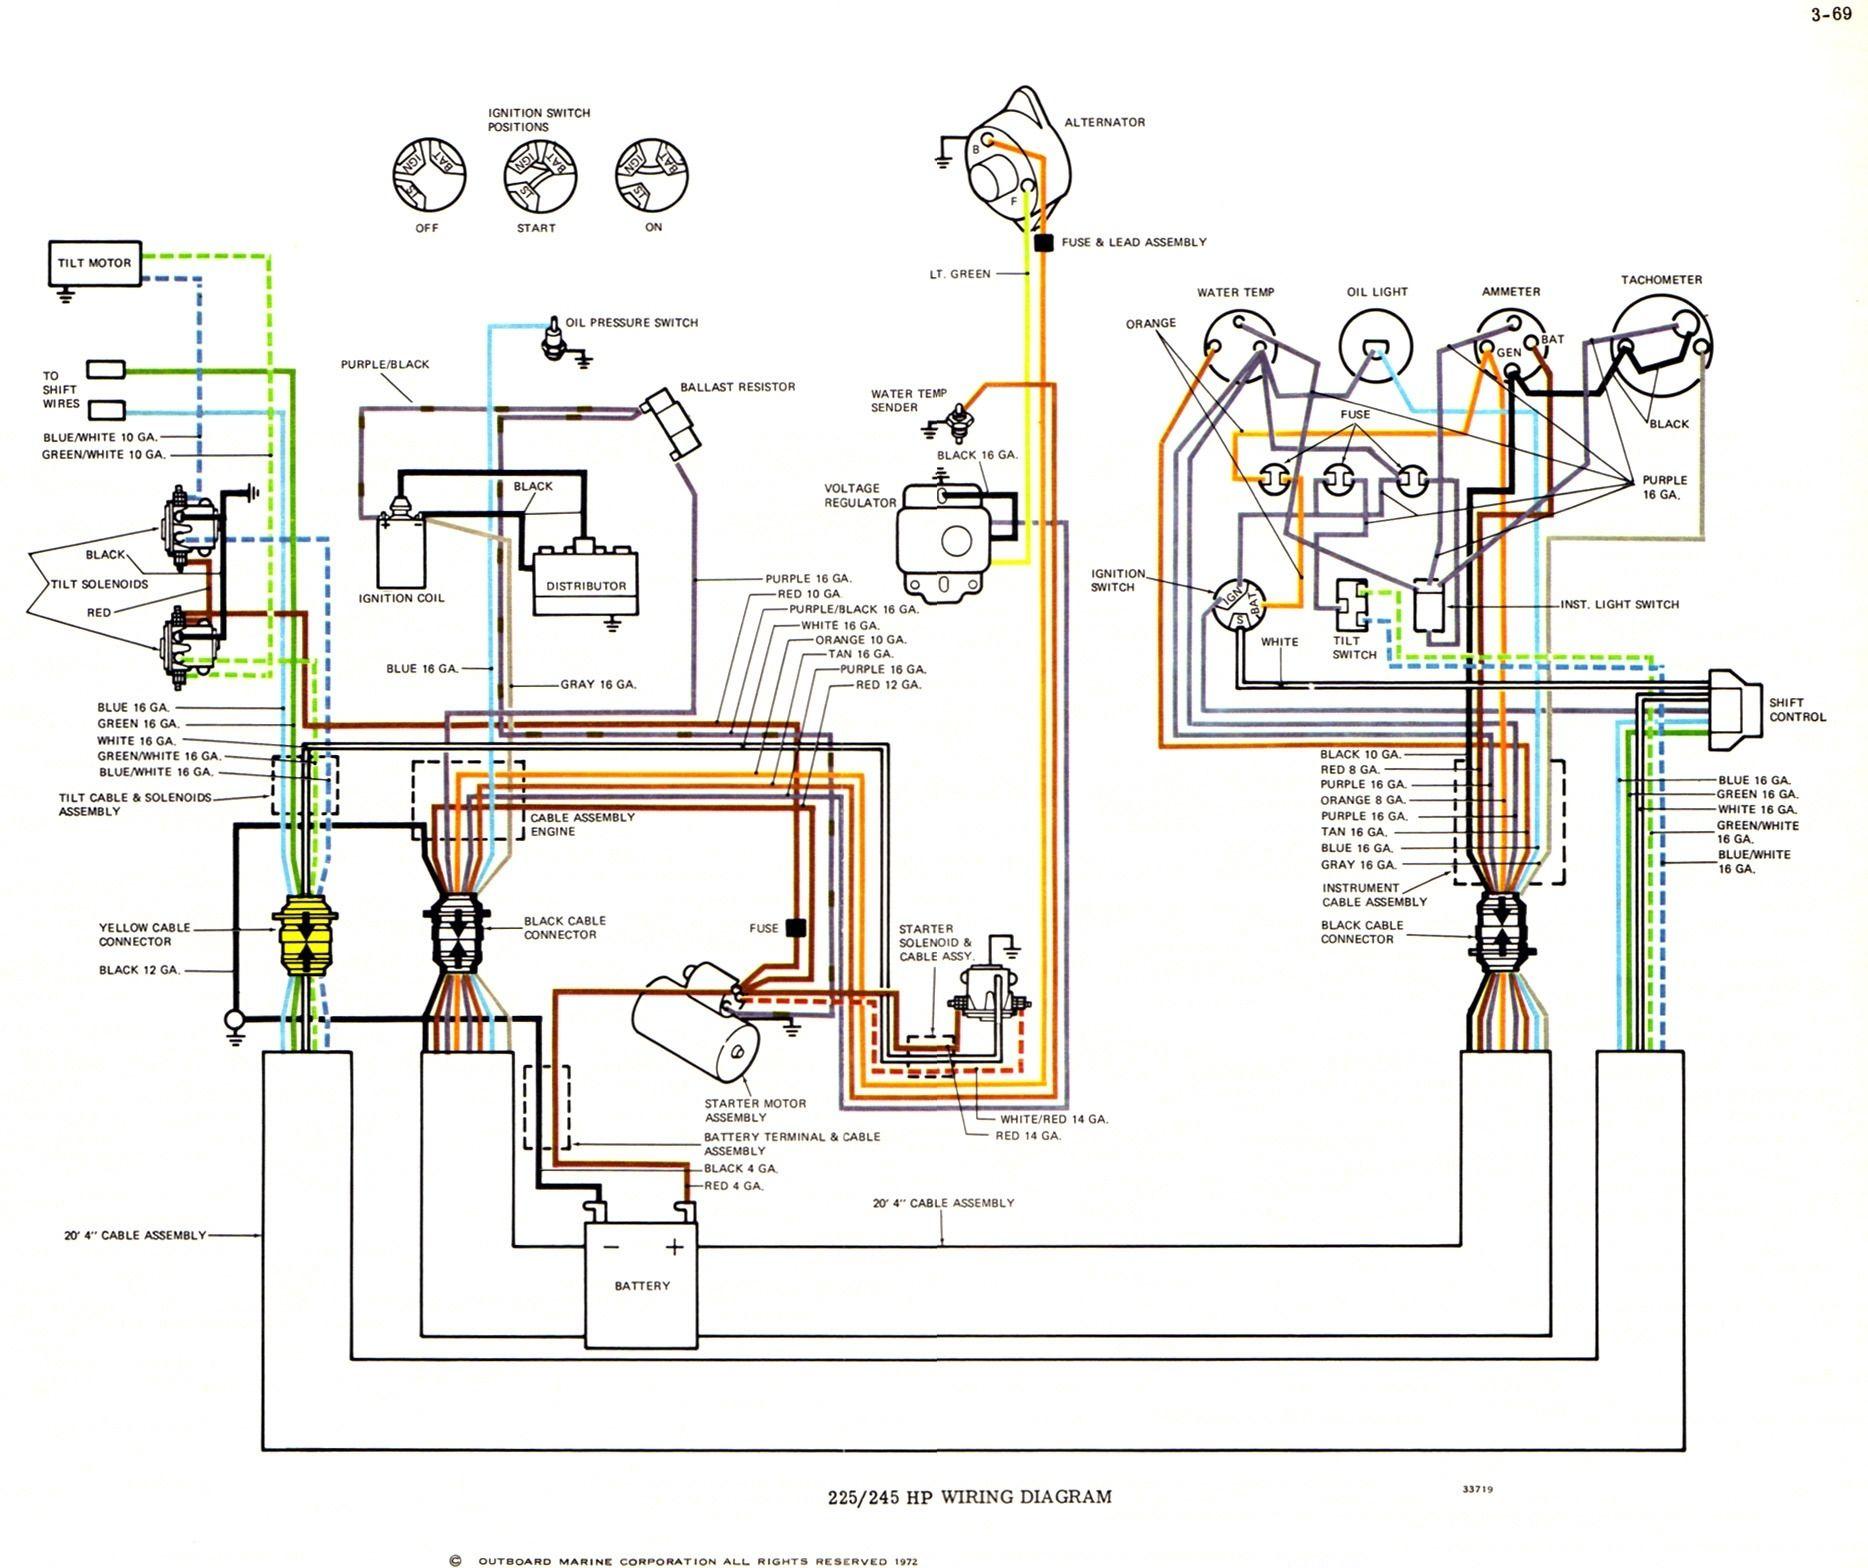 Yamaha Outboard Electrical Wiring Diagram | WiringDiagram